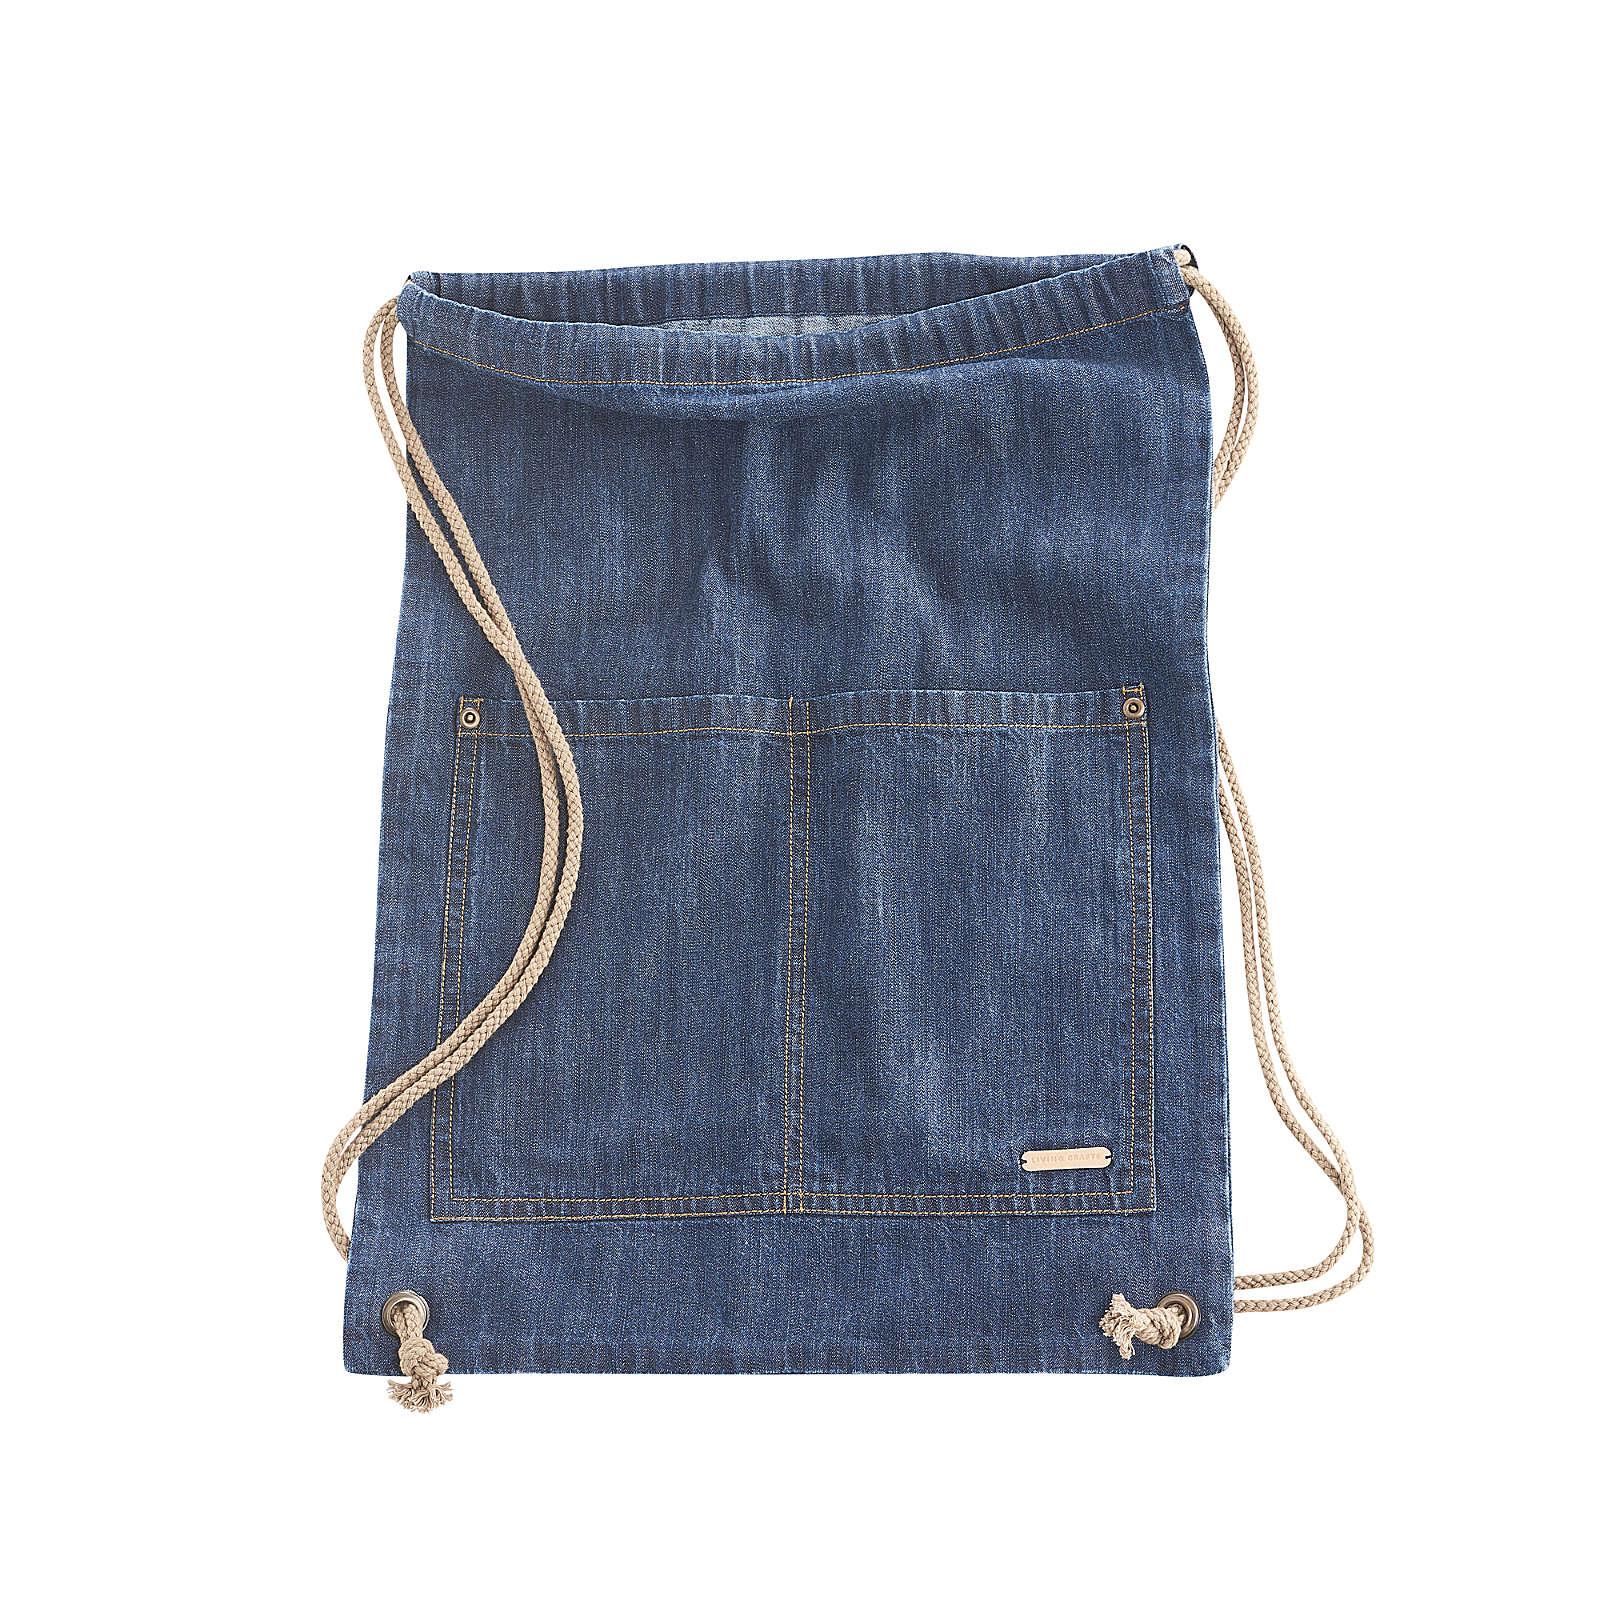 LIVING CRAFTS Matchbag indigo